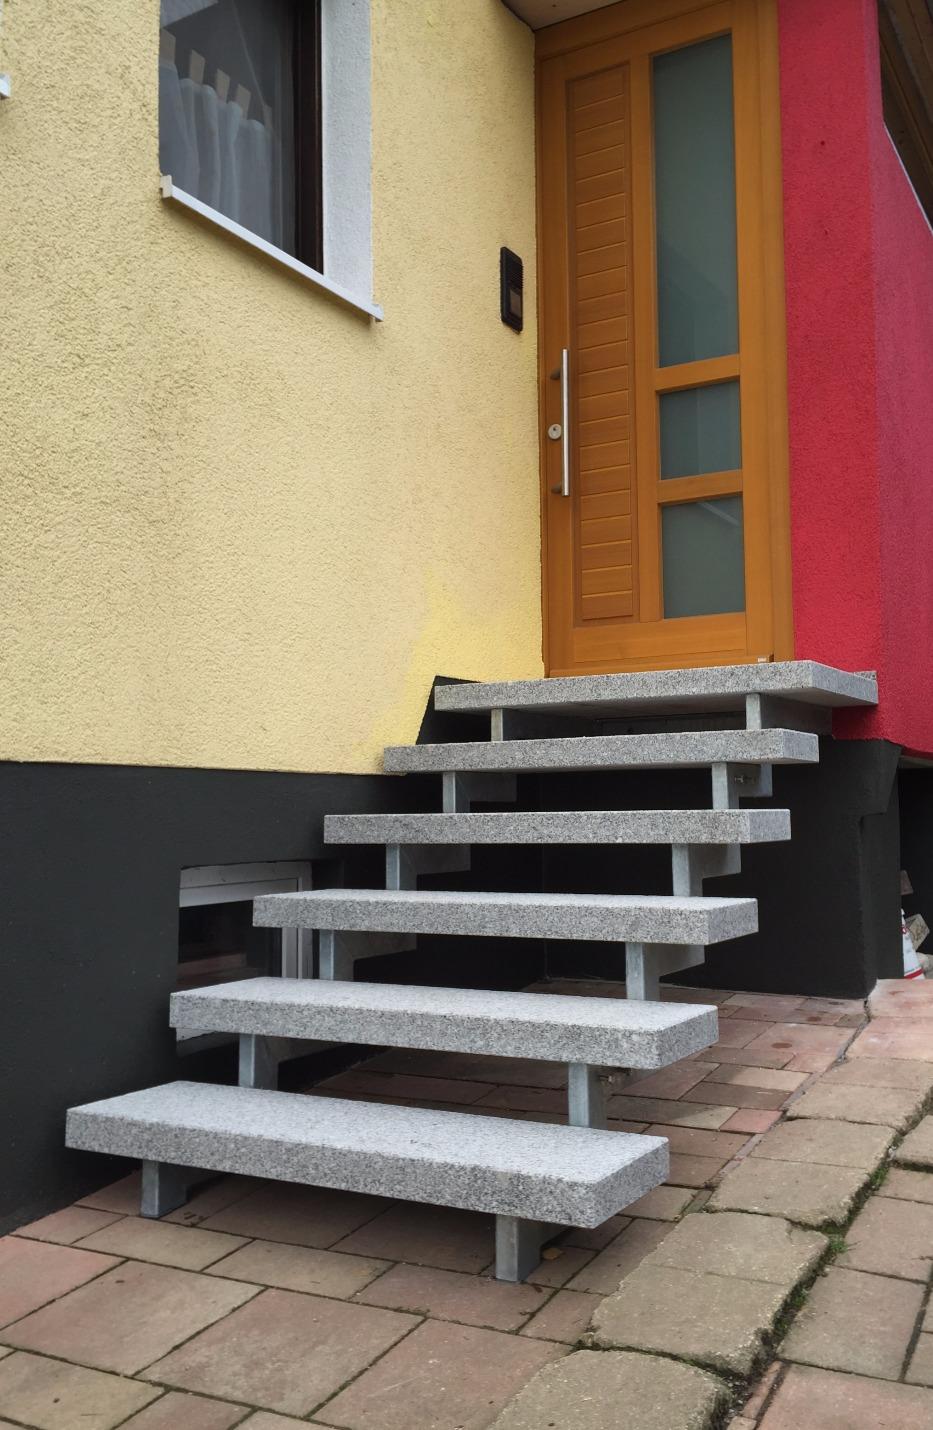 Stahlholmtreppenkonstruktion